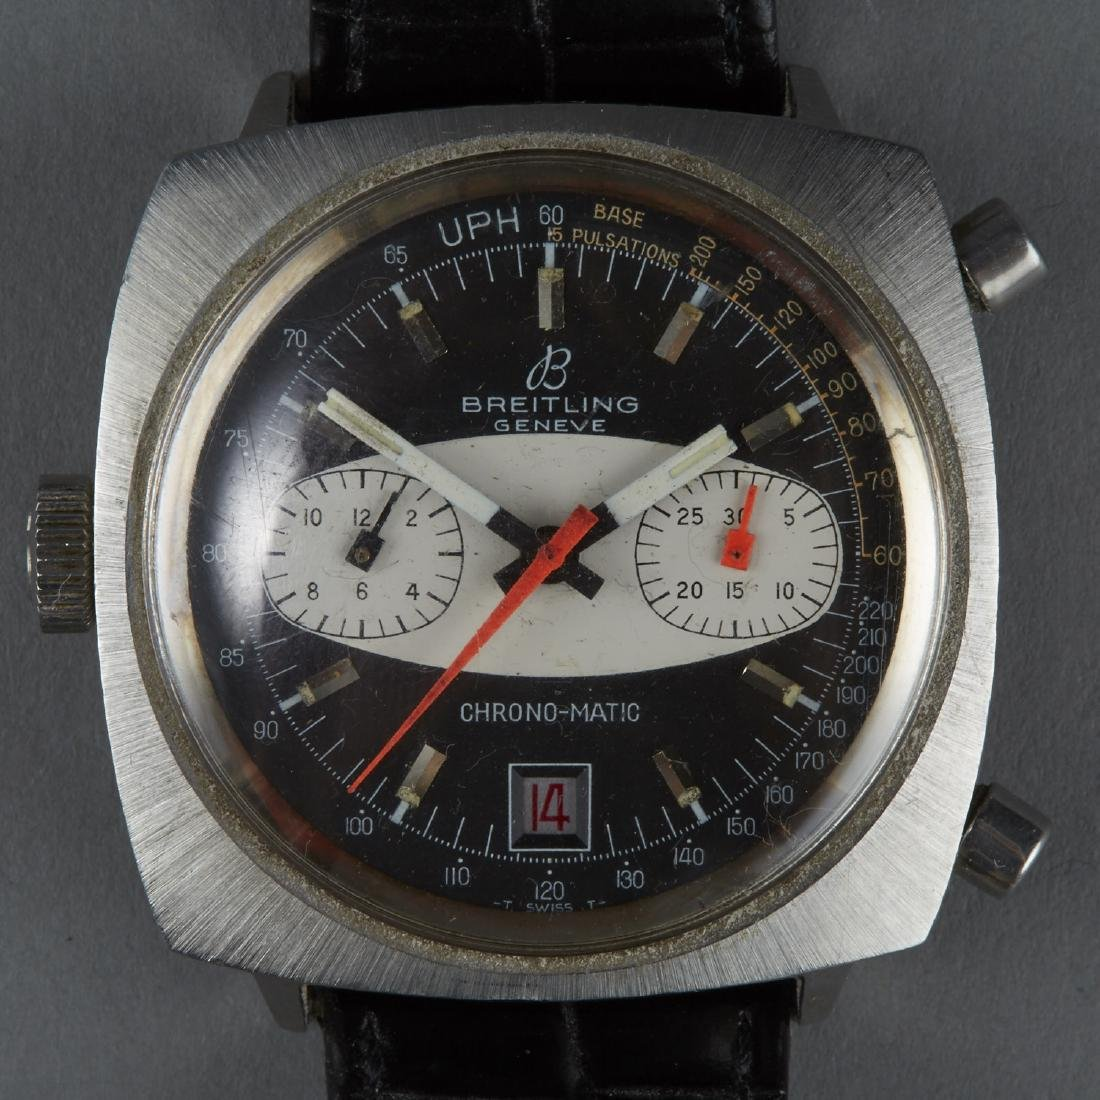 Breitling Chrono-Matic 2111 Watch